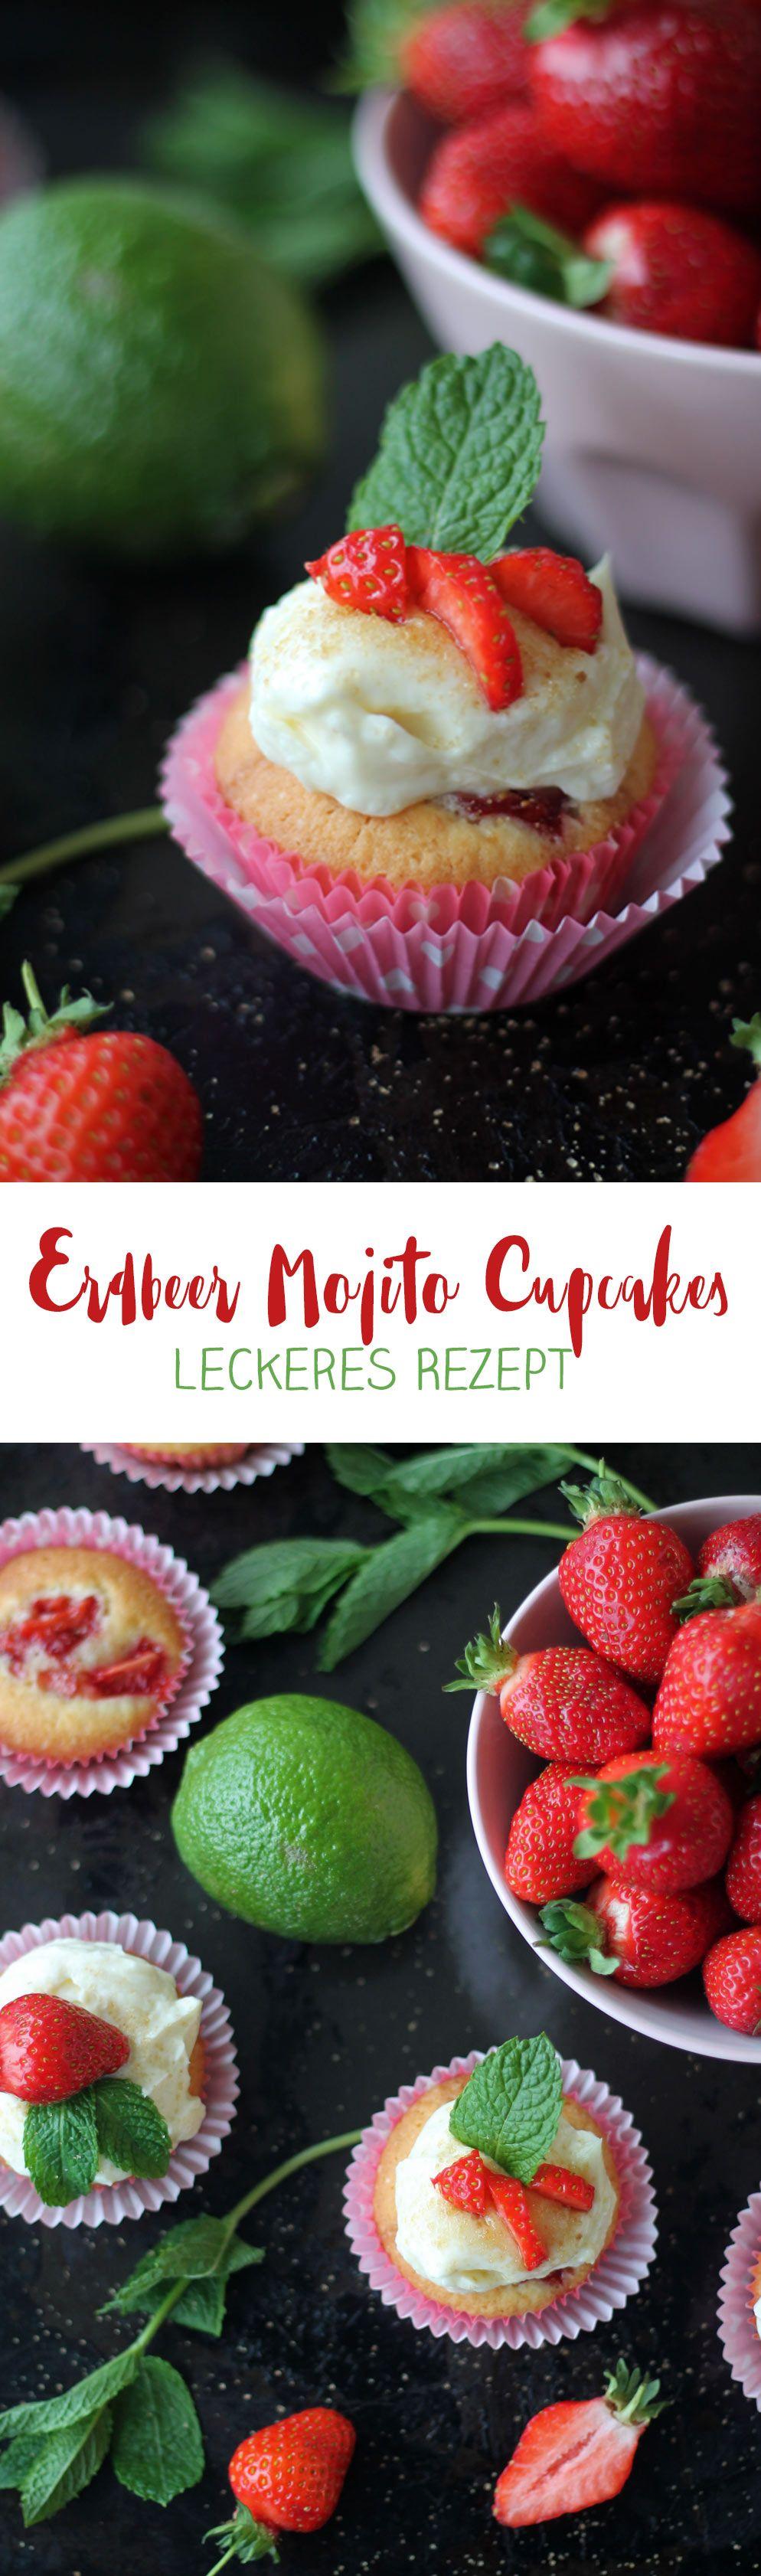 Erdbeer Mojito Cupcakes Cocktails Als Cupcakes Rezepte Rezepte Mojito Cupcakes Erdbeer Mojito